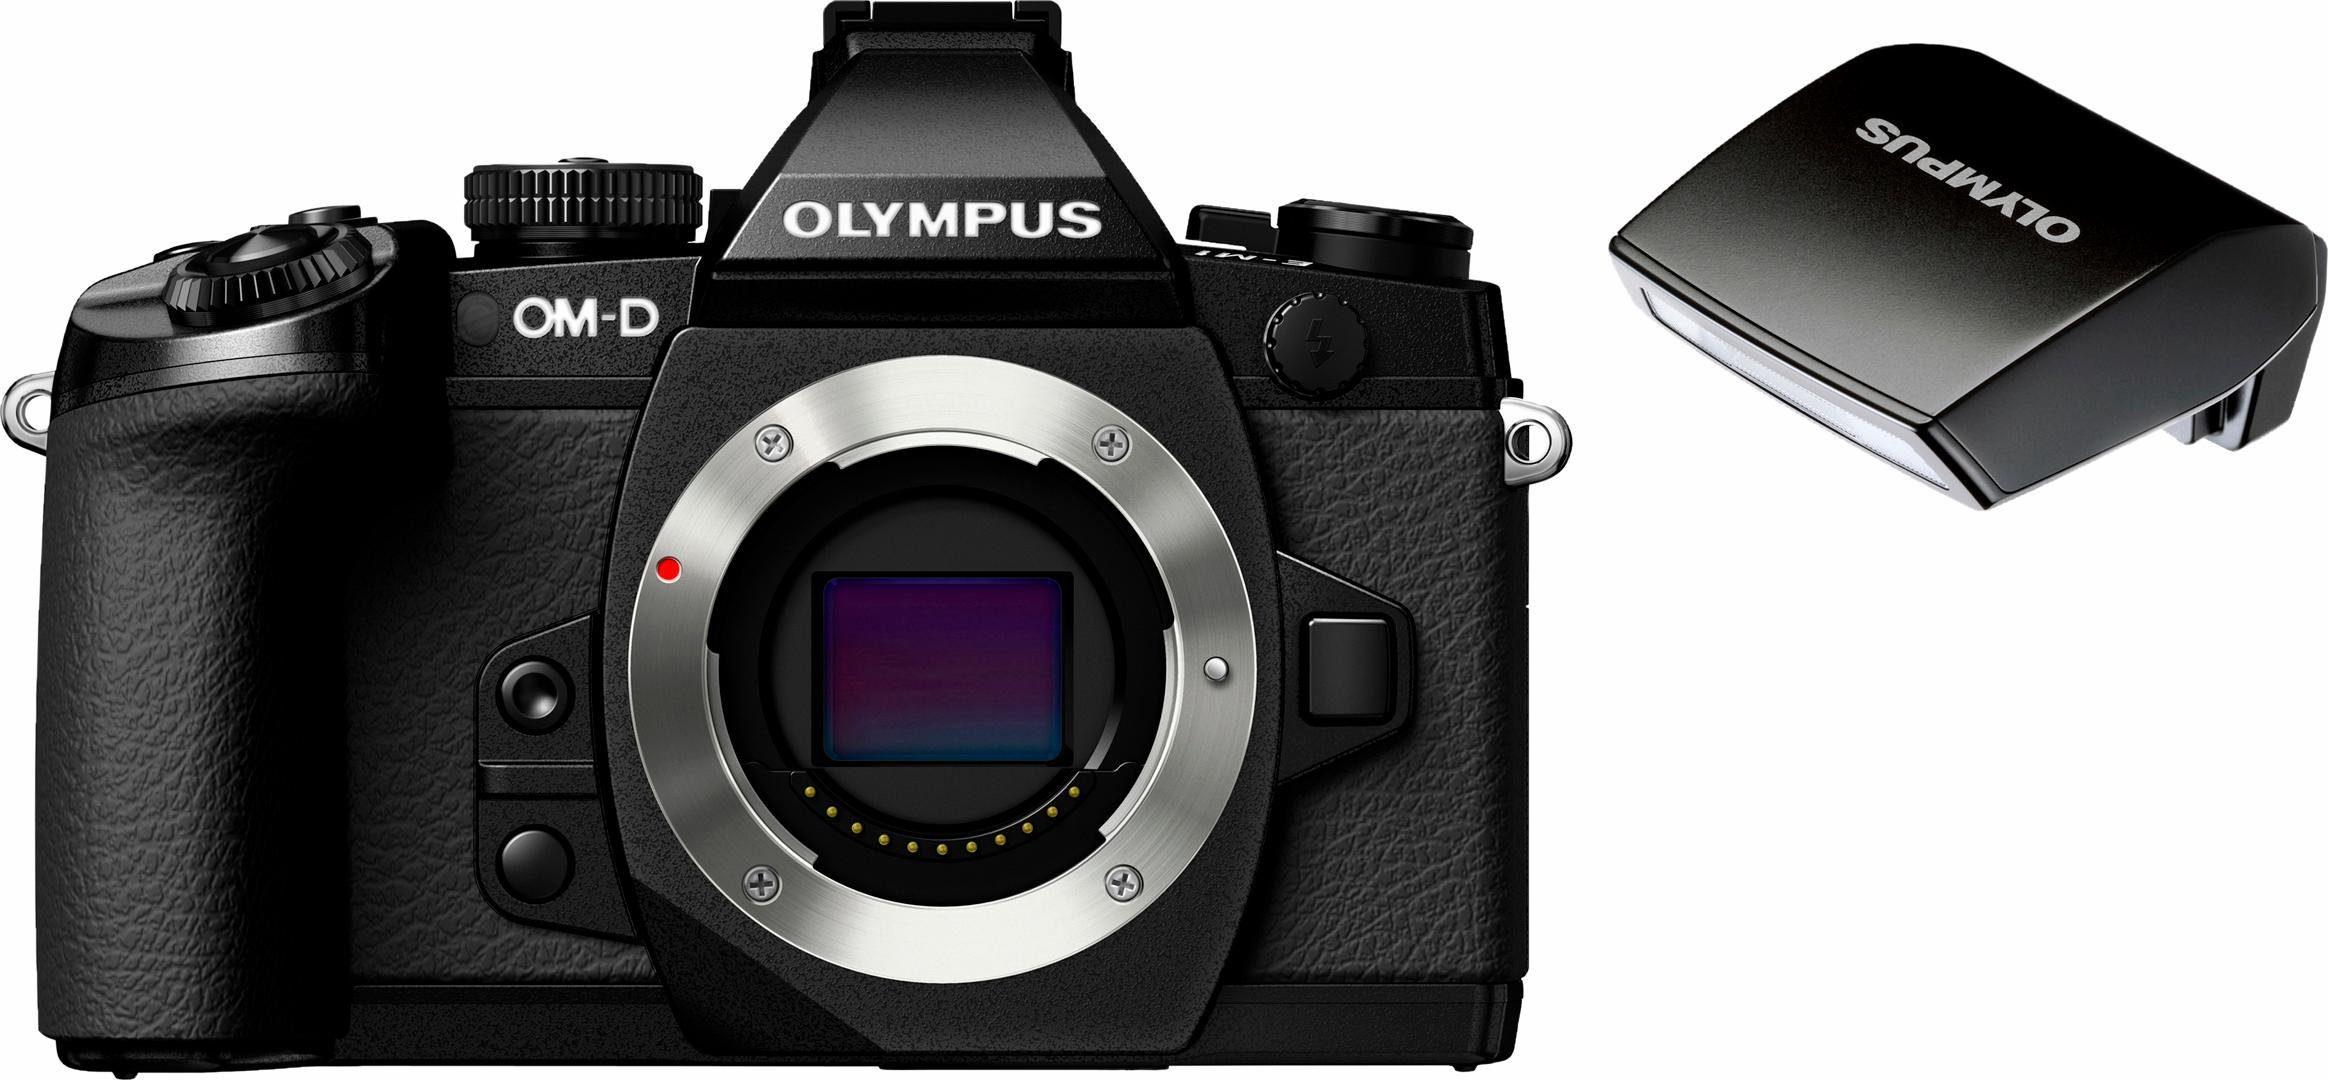 Olympus OM-D E-M1 Body System Kamera, 16,3 Megapixel, 7,6 cm (3 Zoll) Display